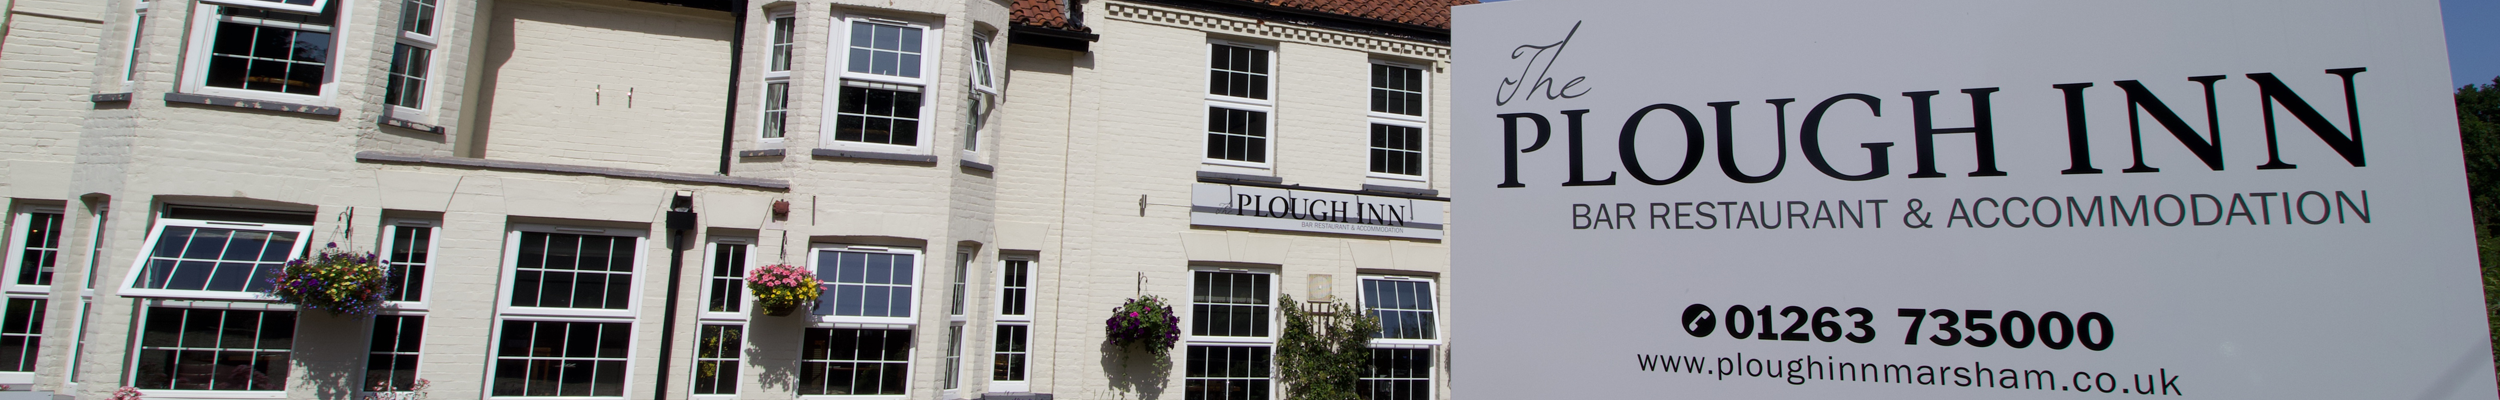 What To Do // Exterior shot of the Plough Inn Bar, Restaurant & Accommodation